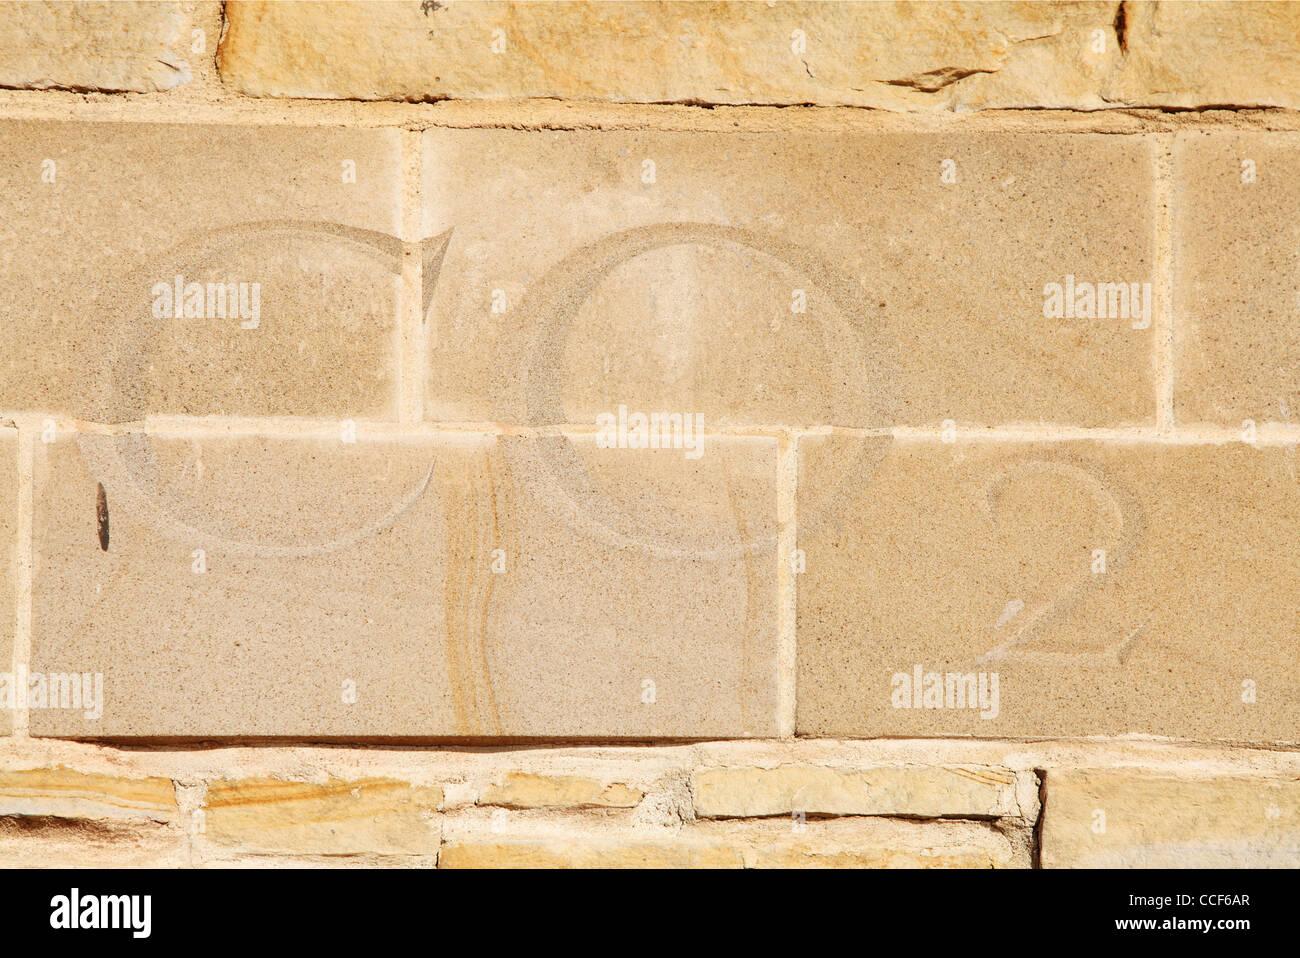 Carbon dioxide letters CO2 carved in stone old lime kilns Sunderland north east England UK - Stock Image